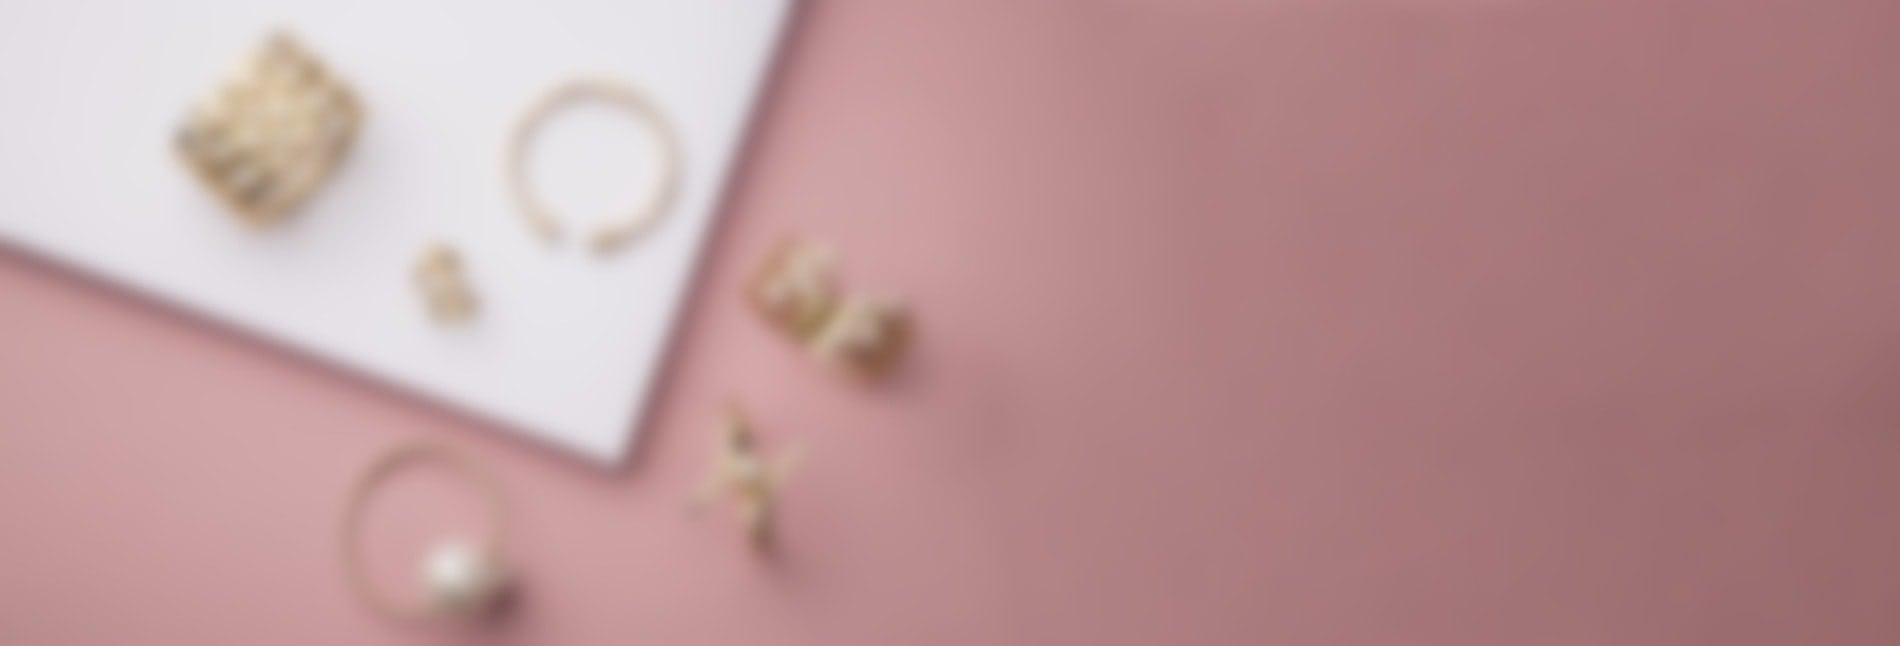 jewelry slide bg 2